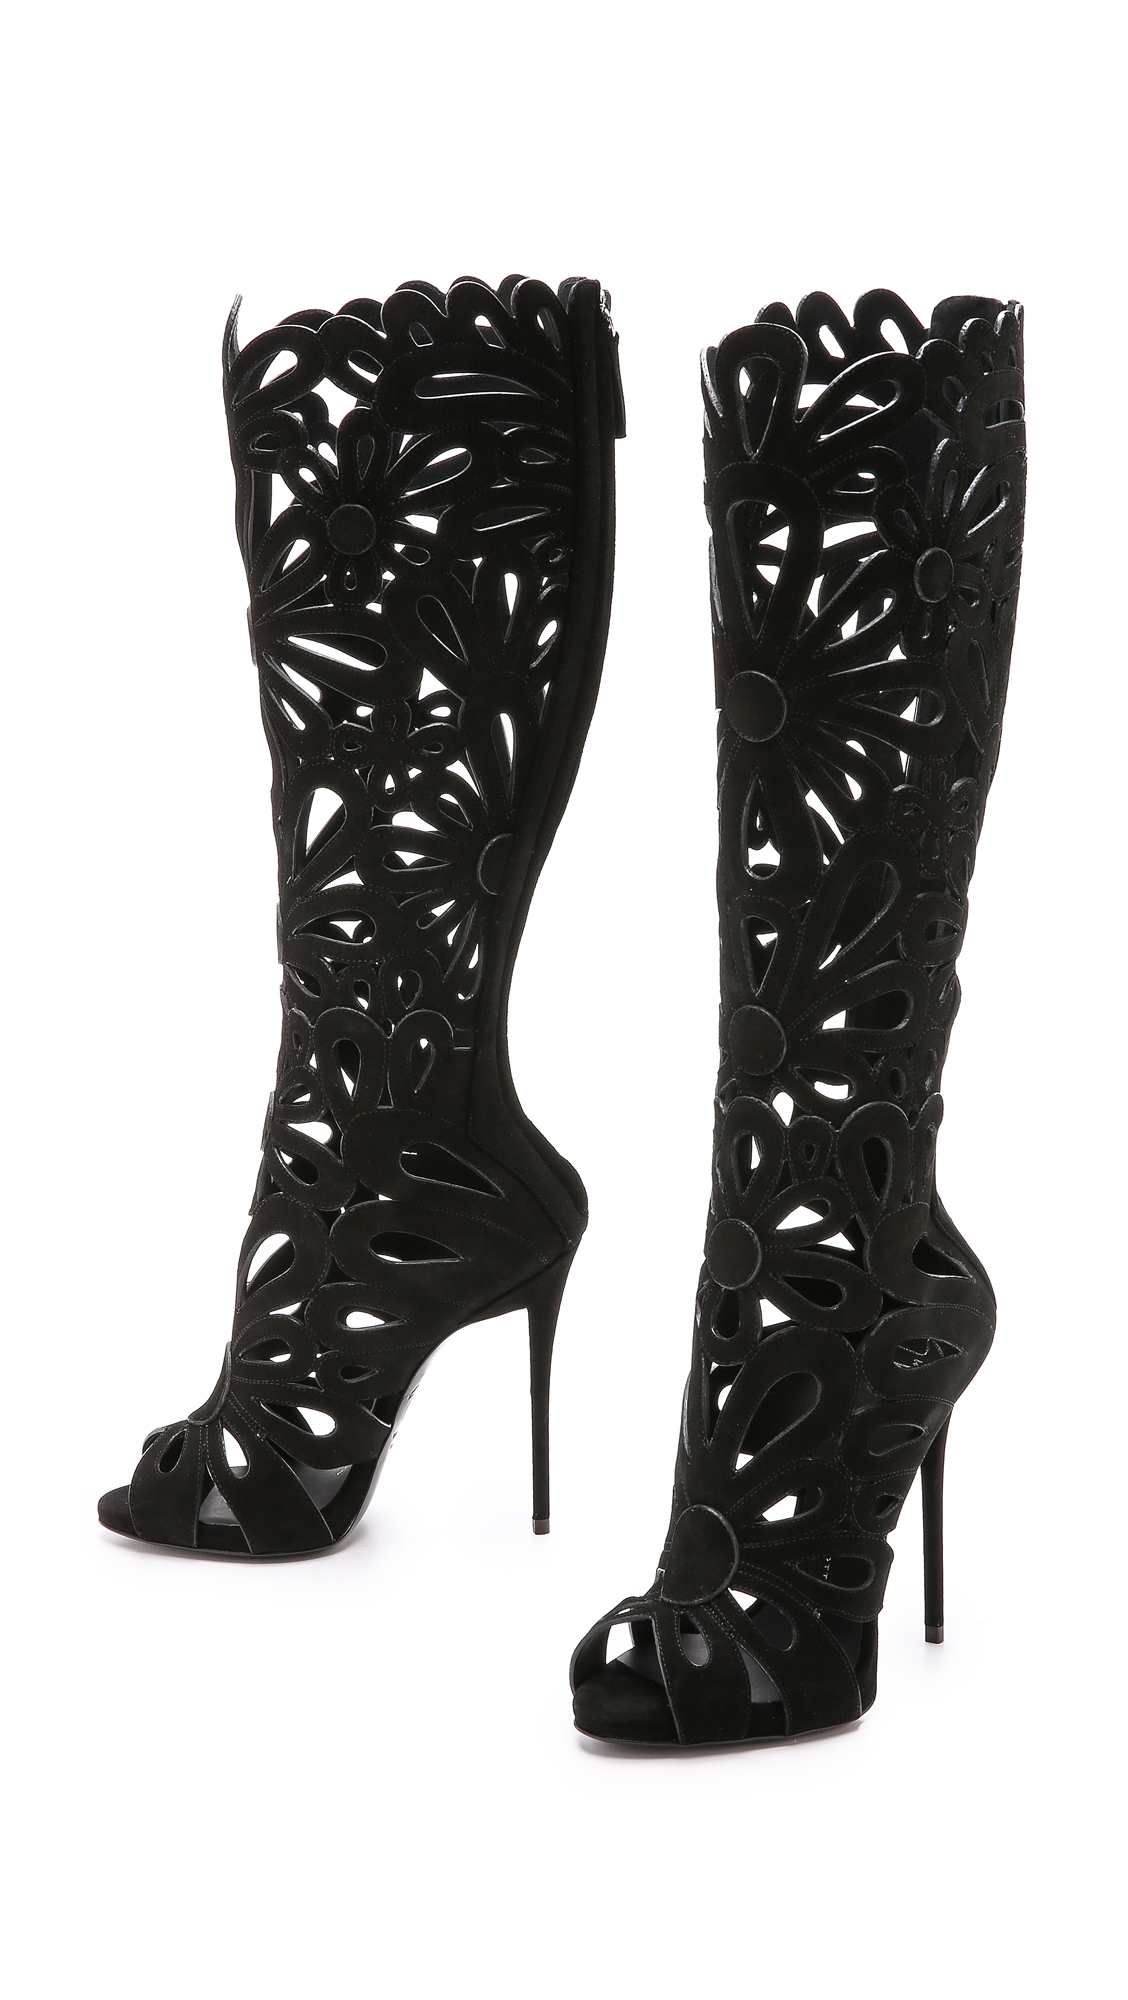 Giuseppe Zanotti Suede Cutout Boots Black In Black Lyst